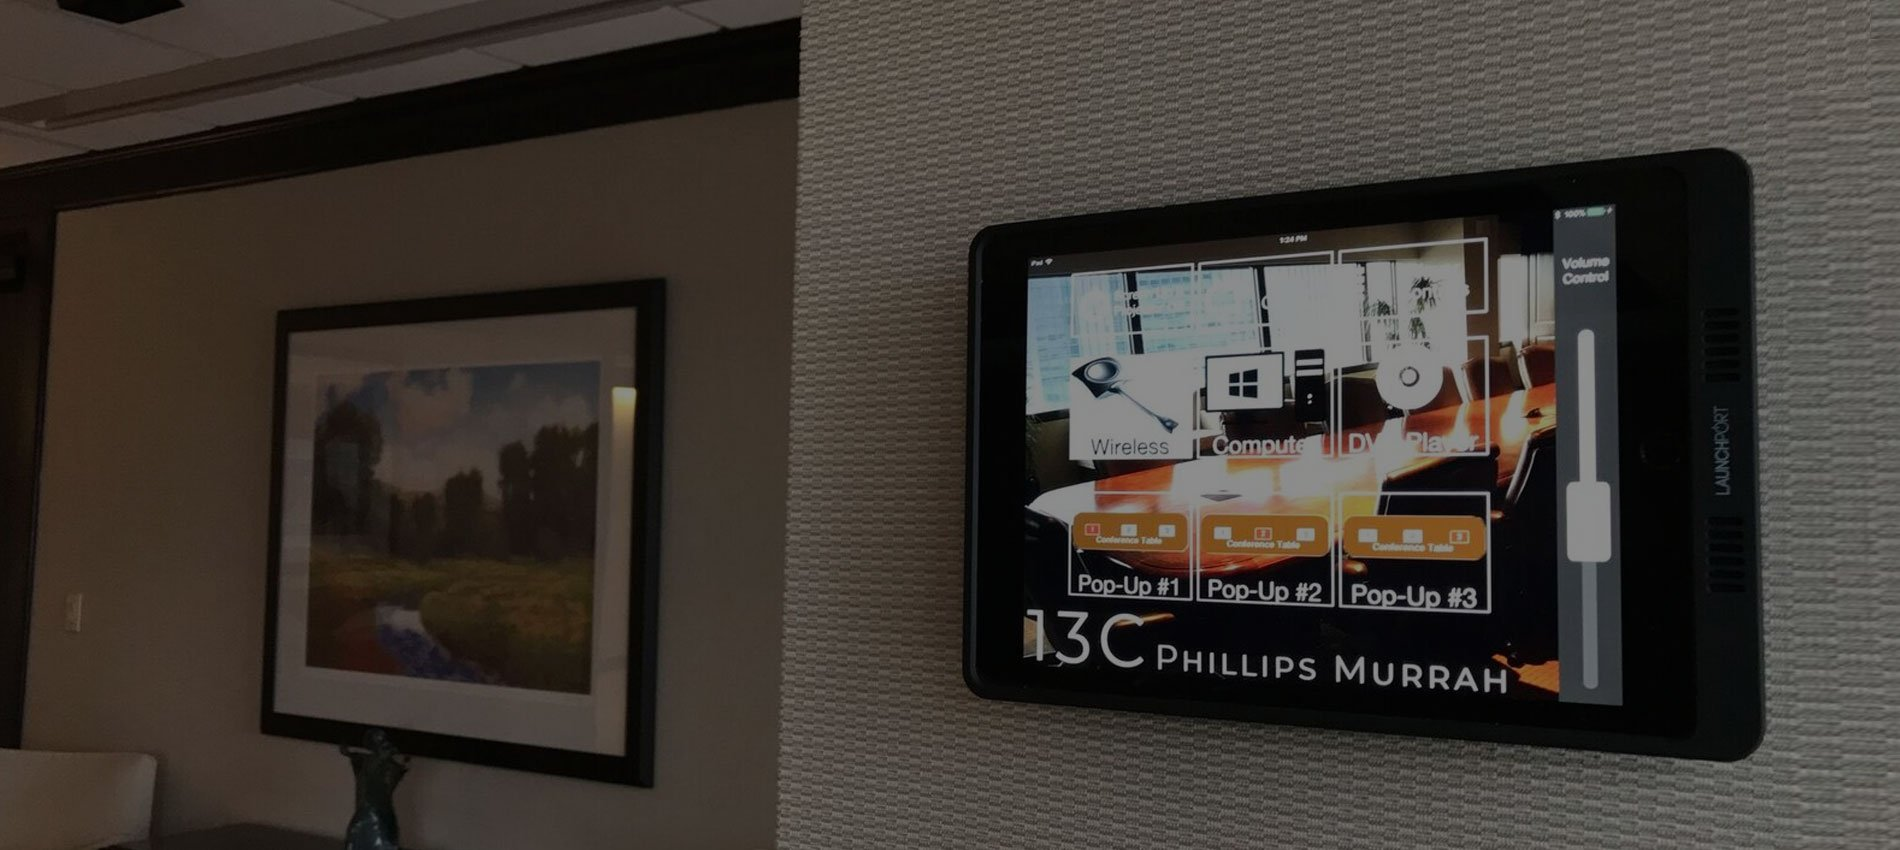 Conference Room Smart Systems for Oklahoma City Tulsa Edmond